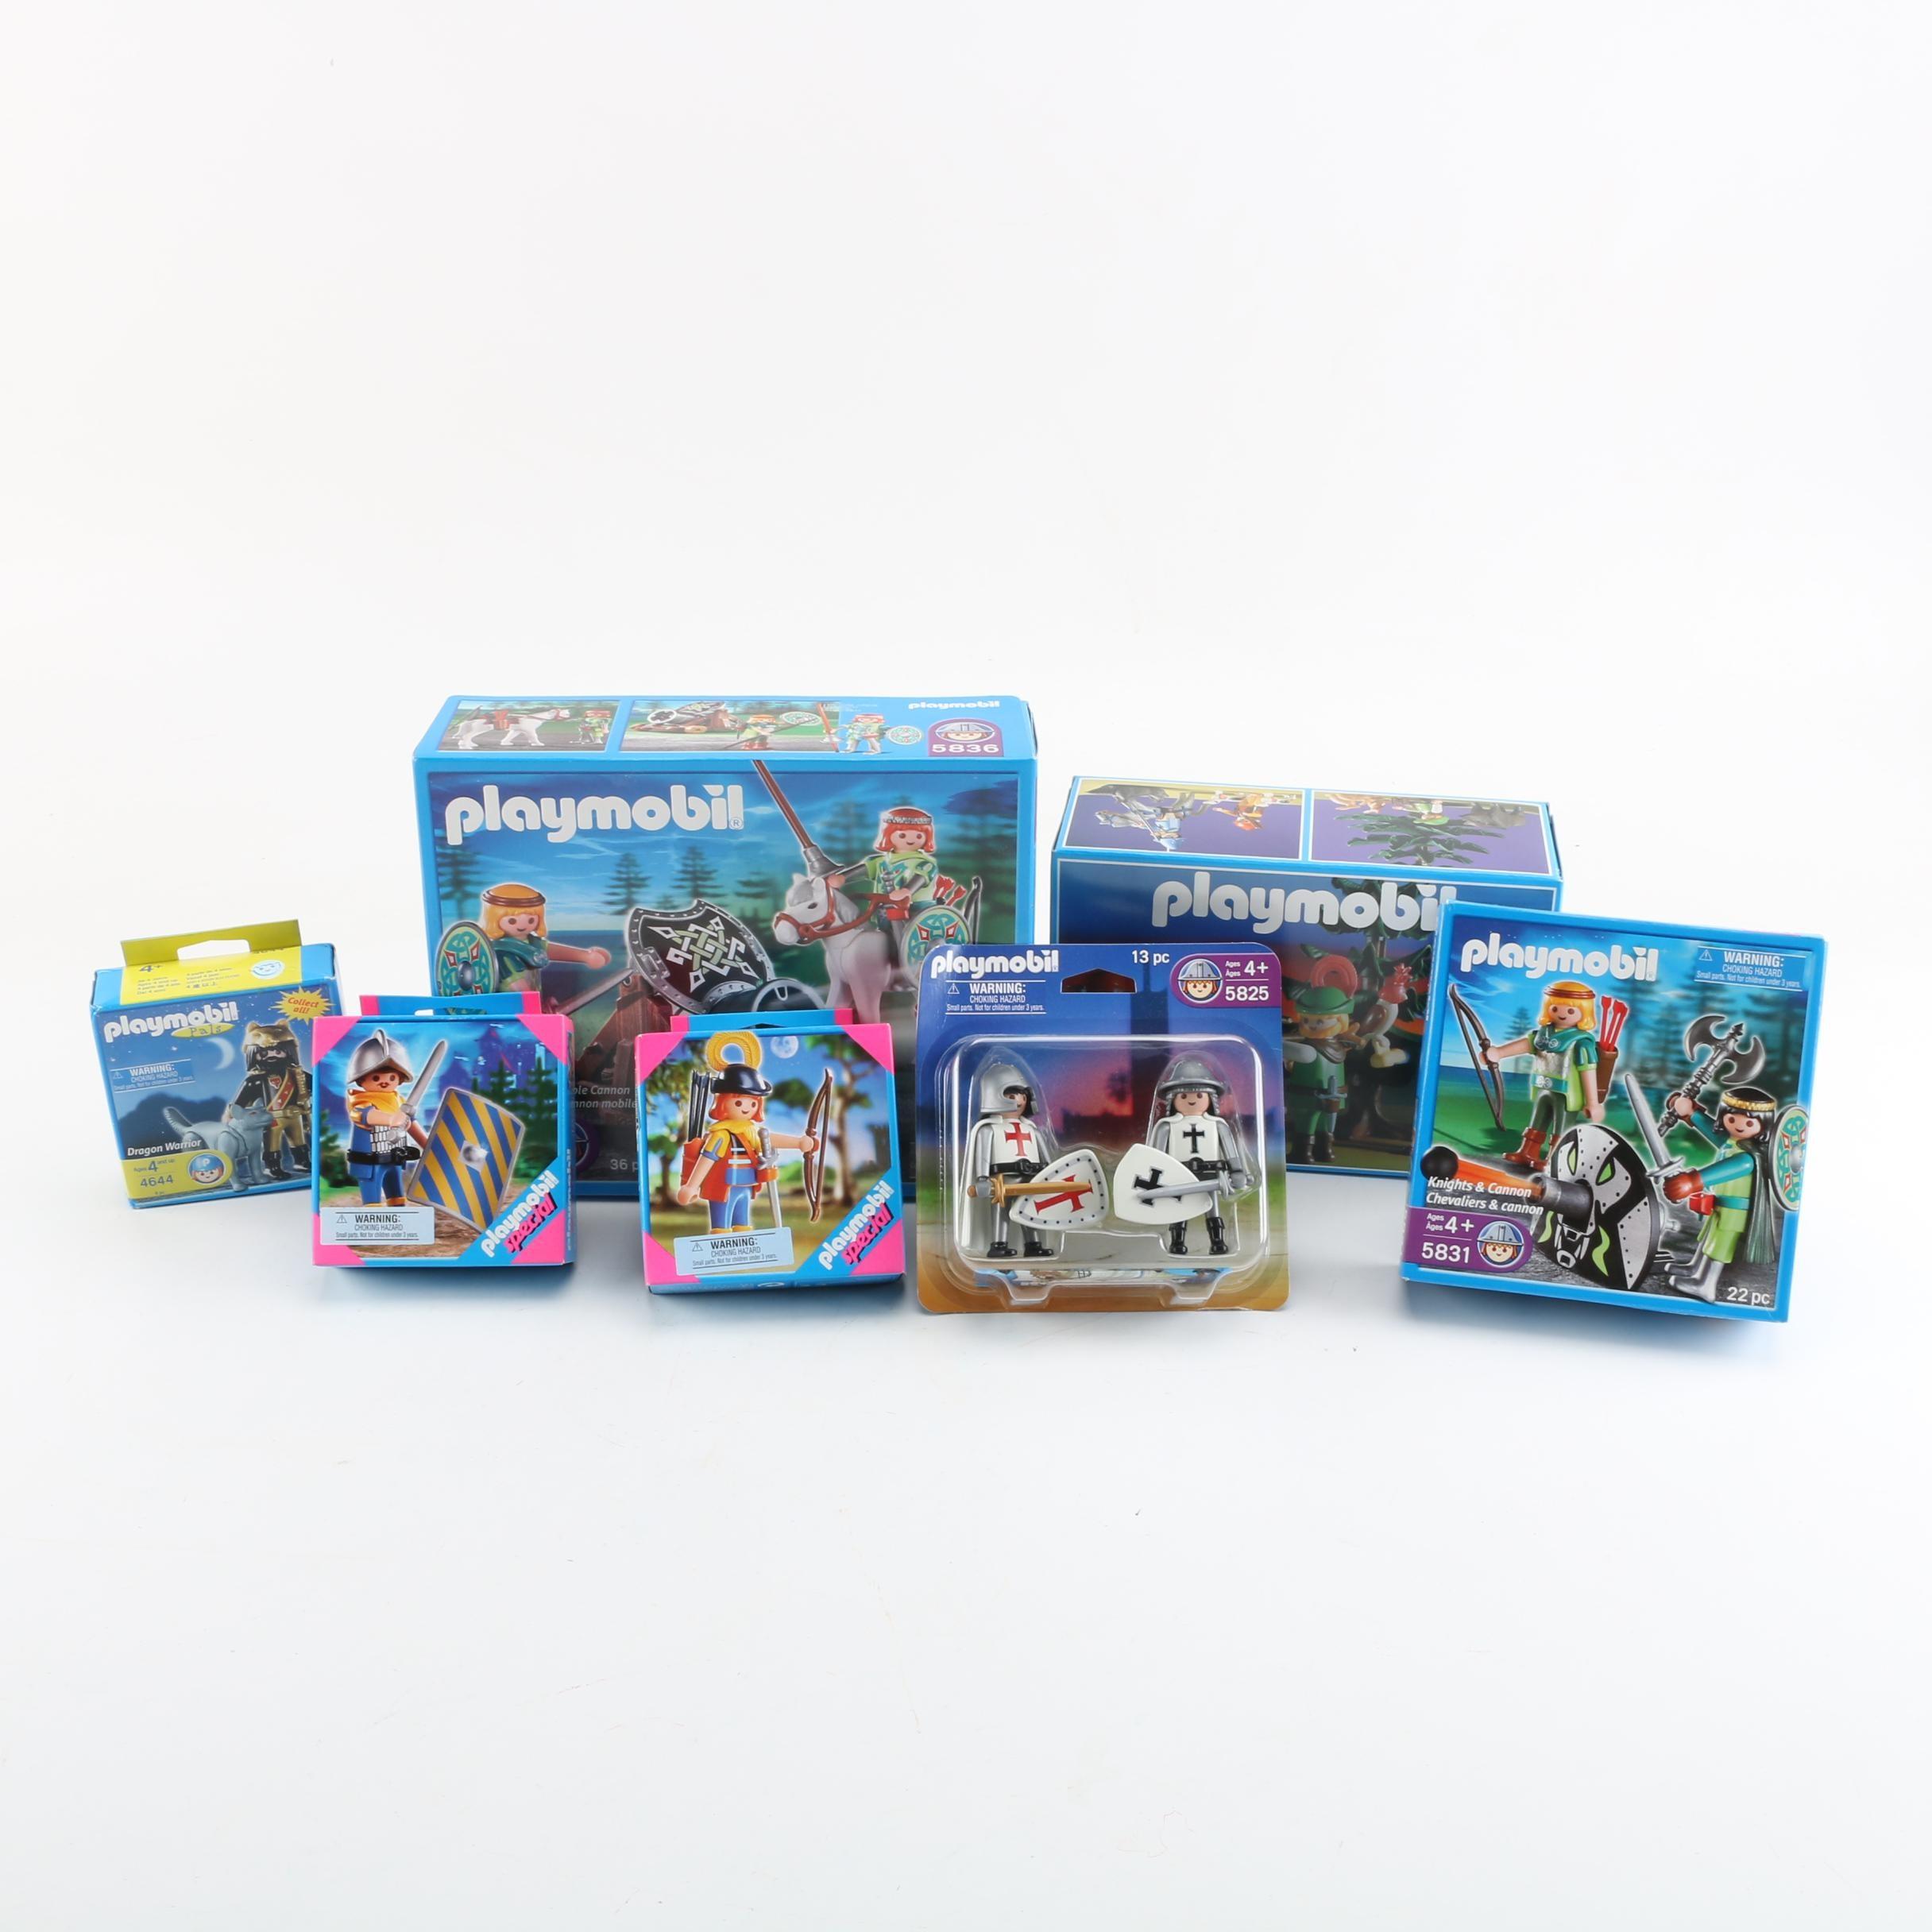 Playmobil Medieval Fantasy Play Sets